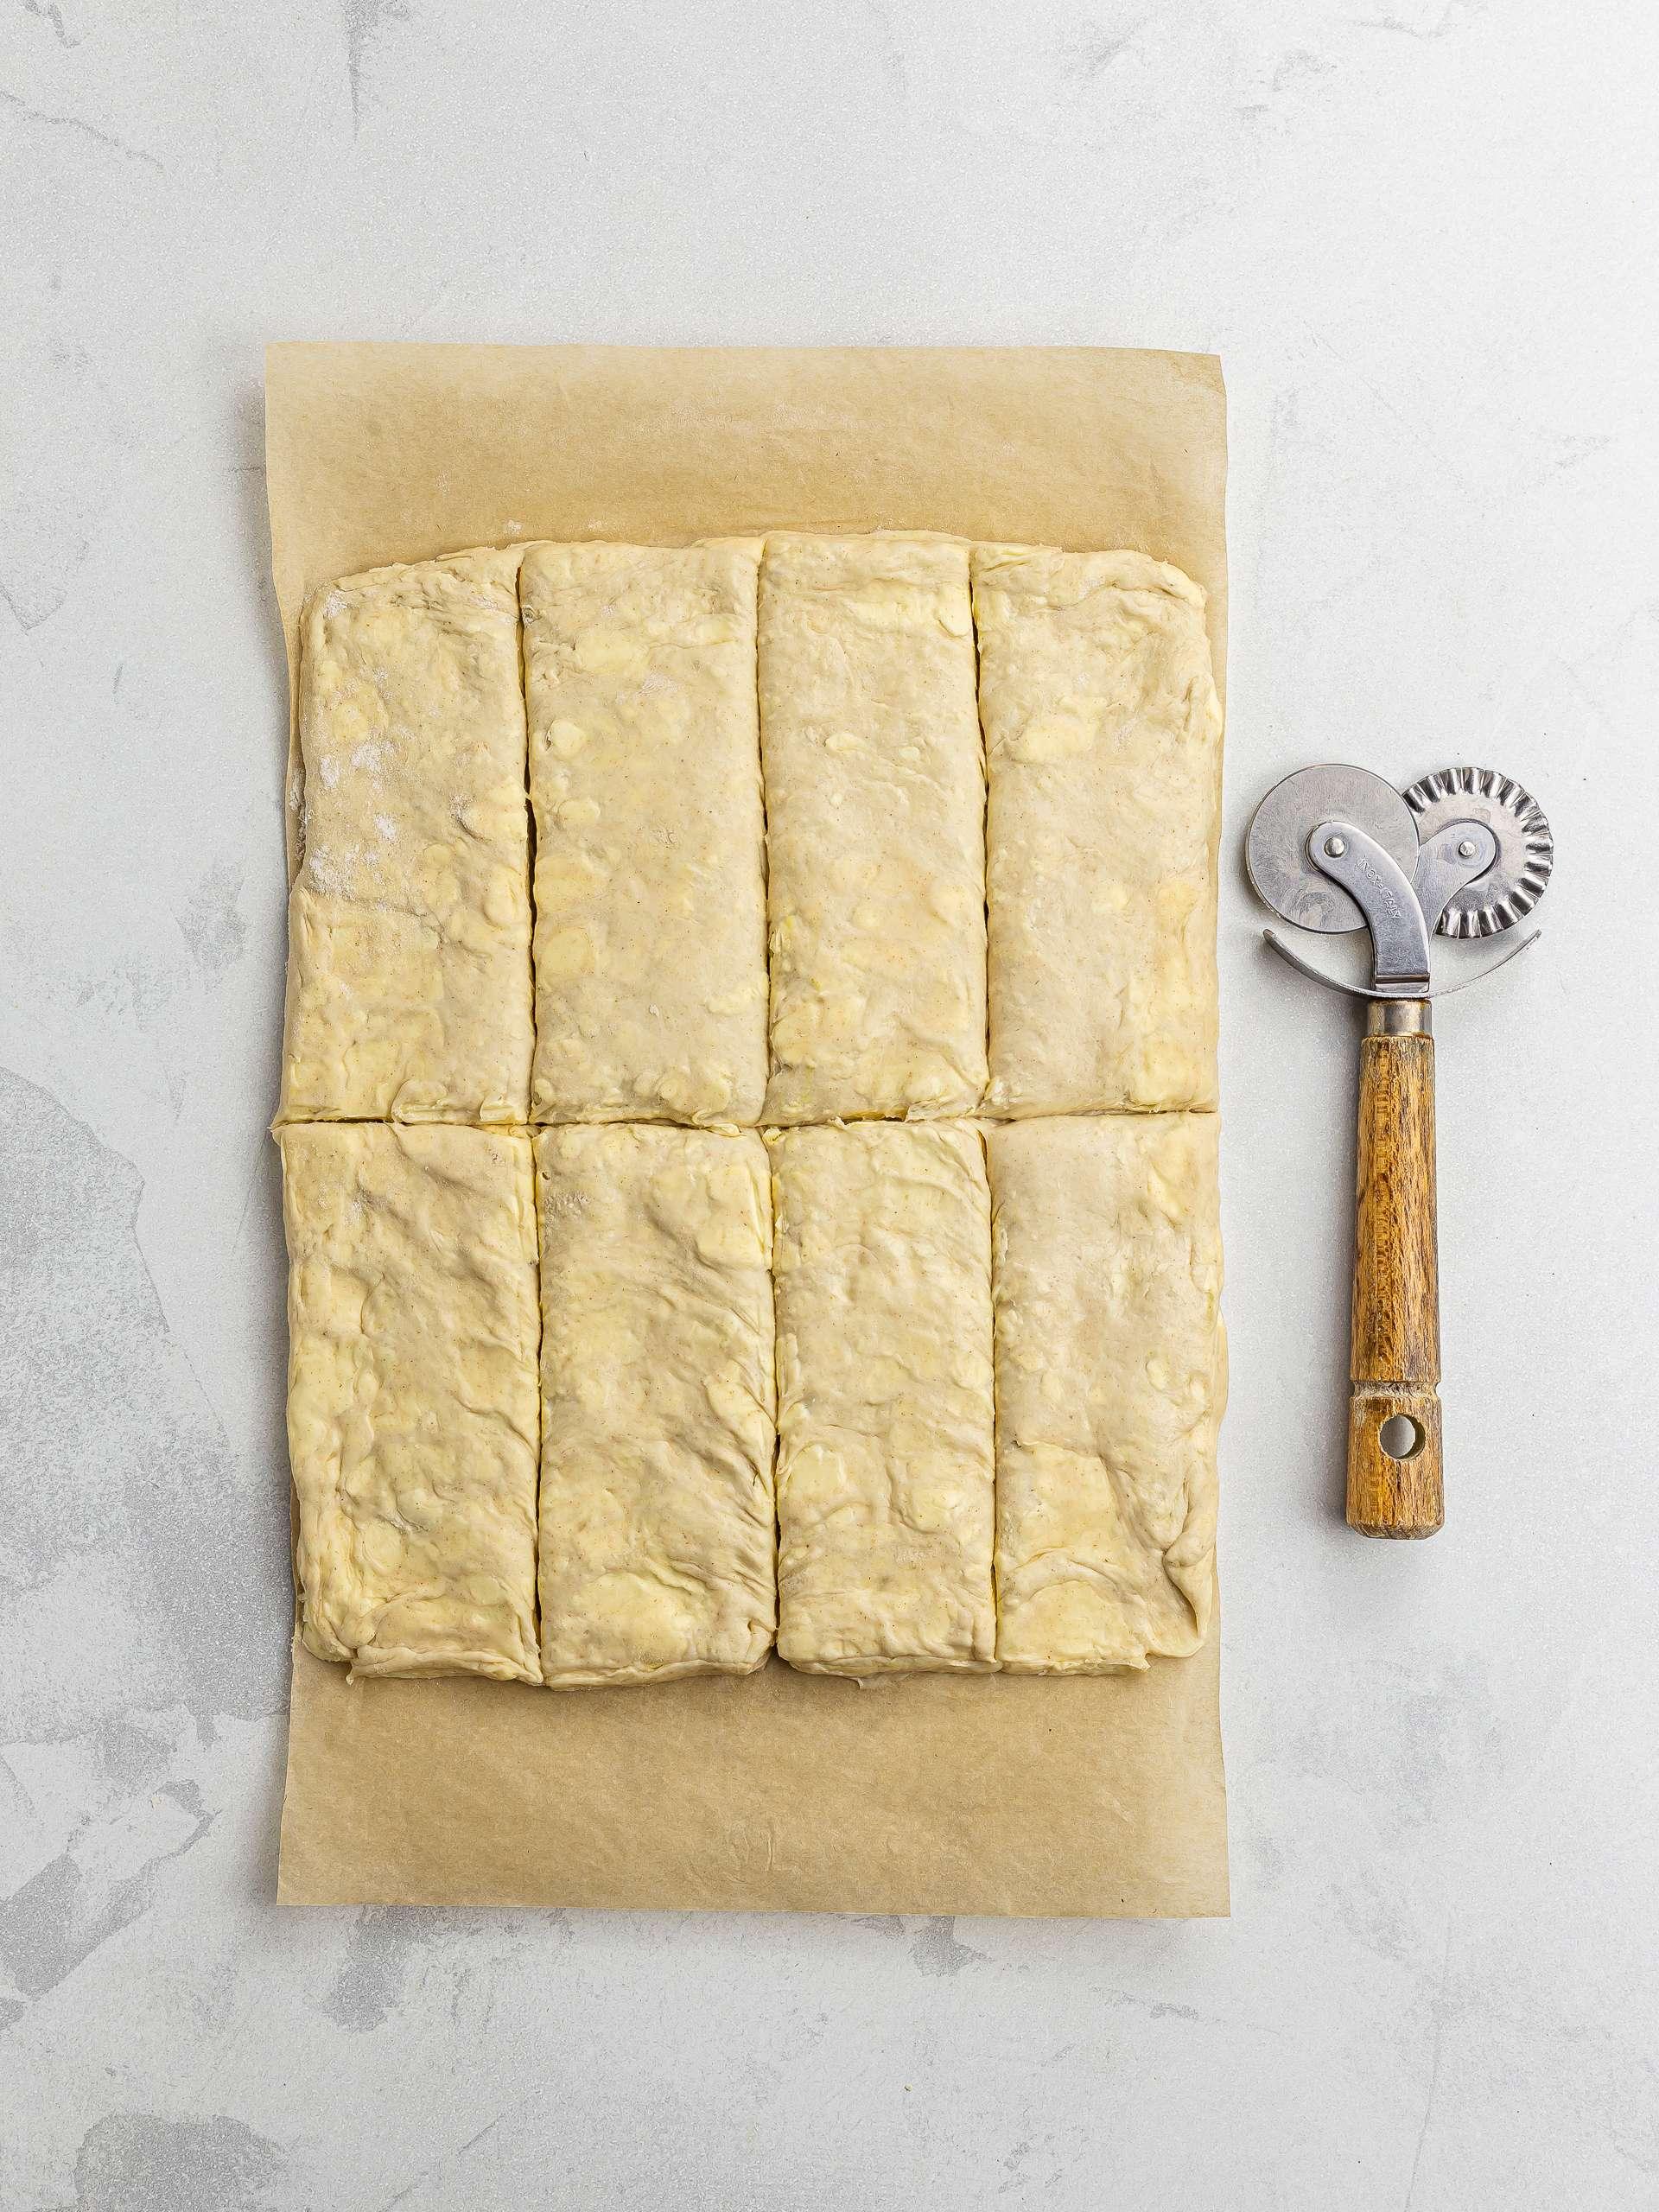 cut out pastry dough for pain au chocolat